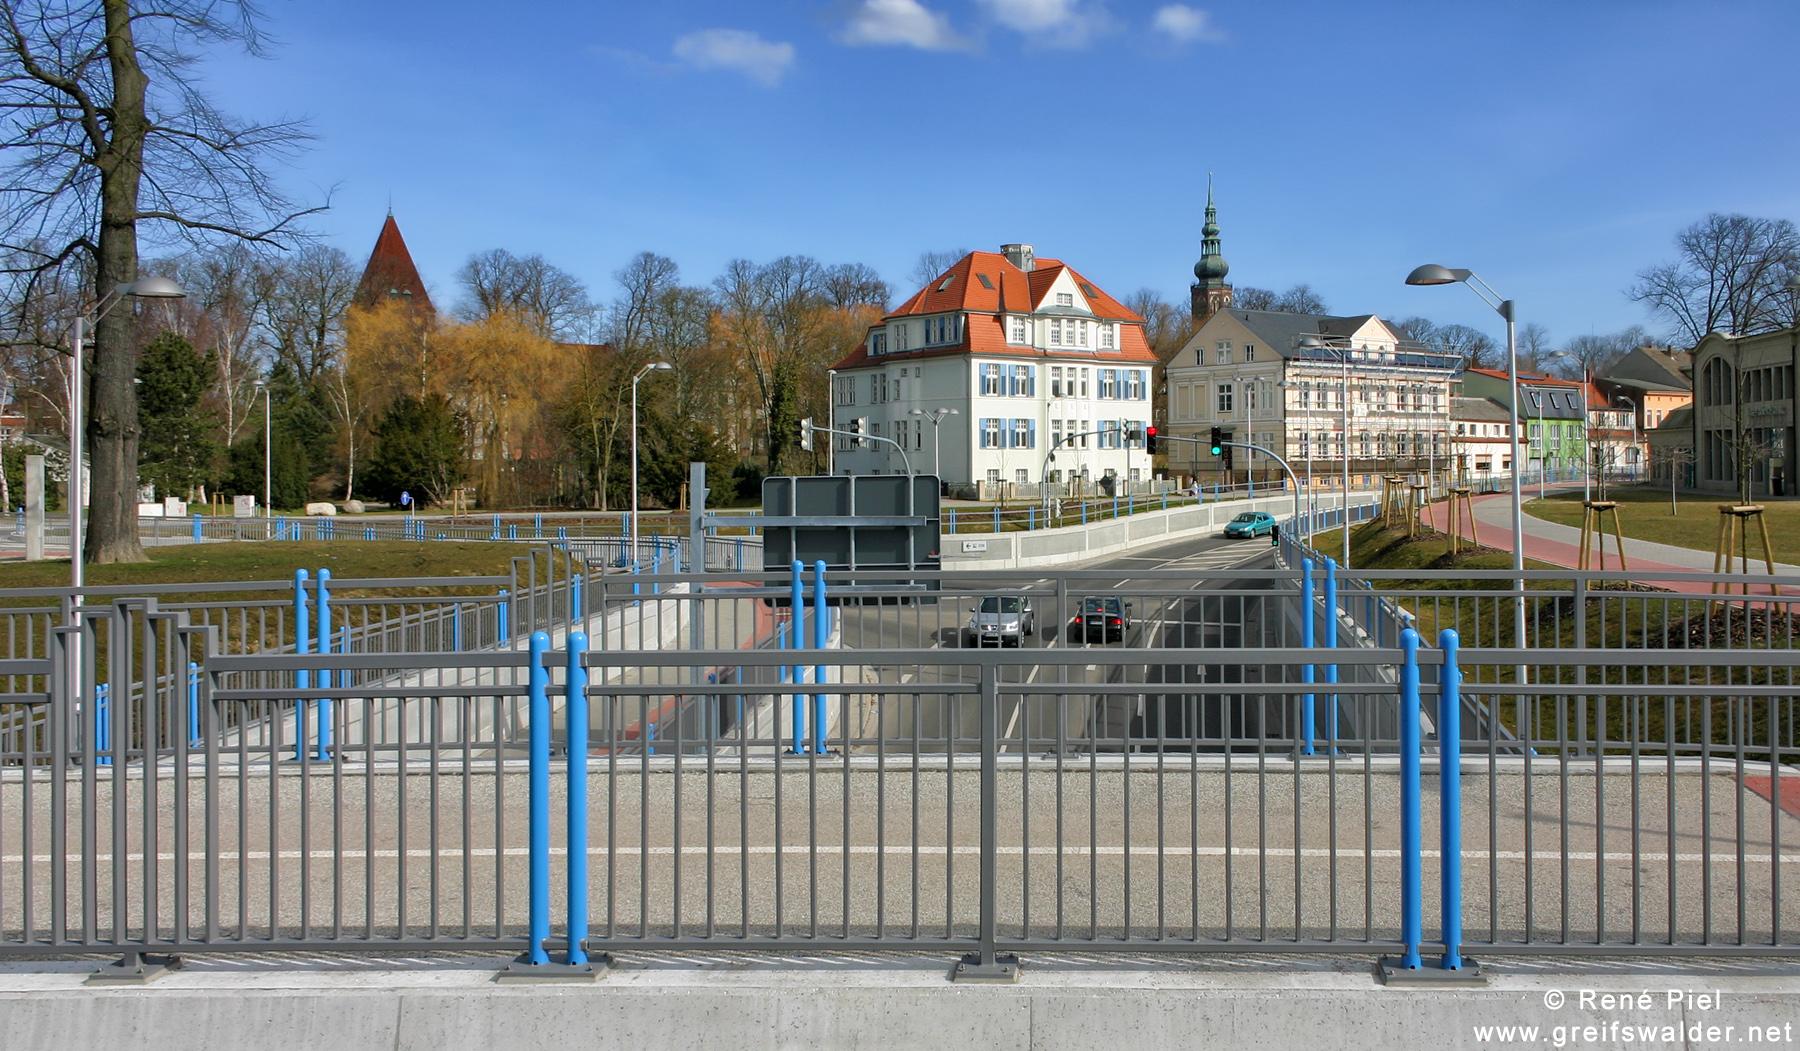 Am Hauptbahnhof in Greifswald